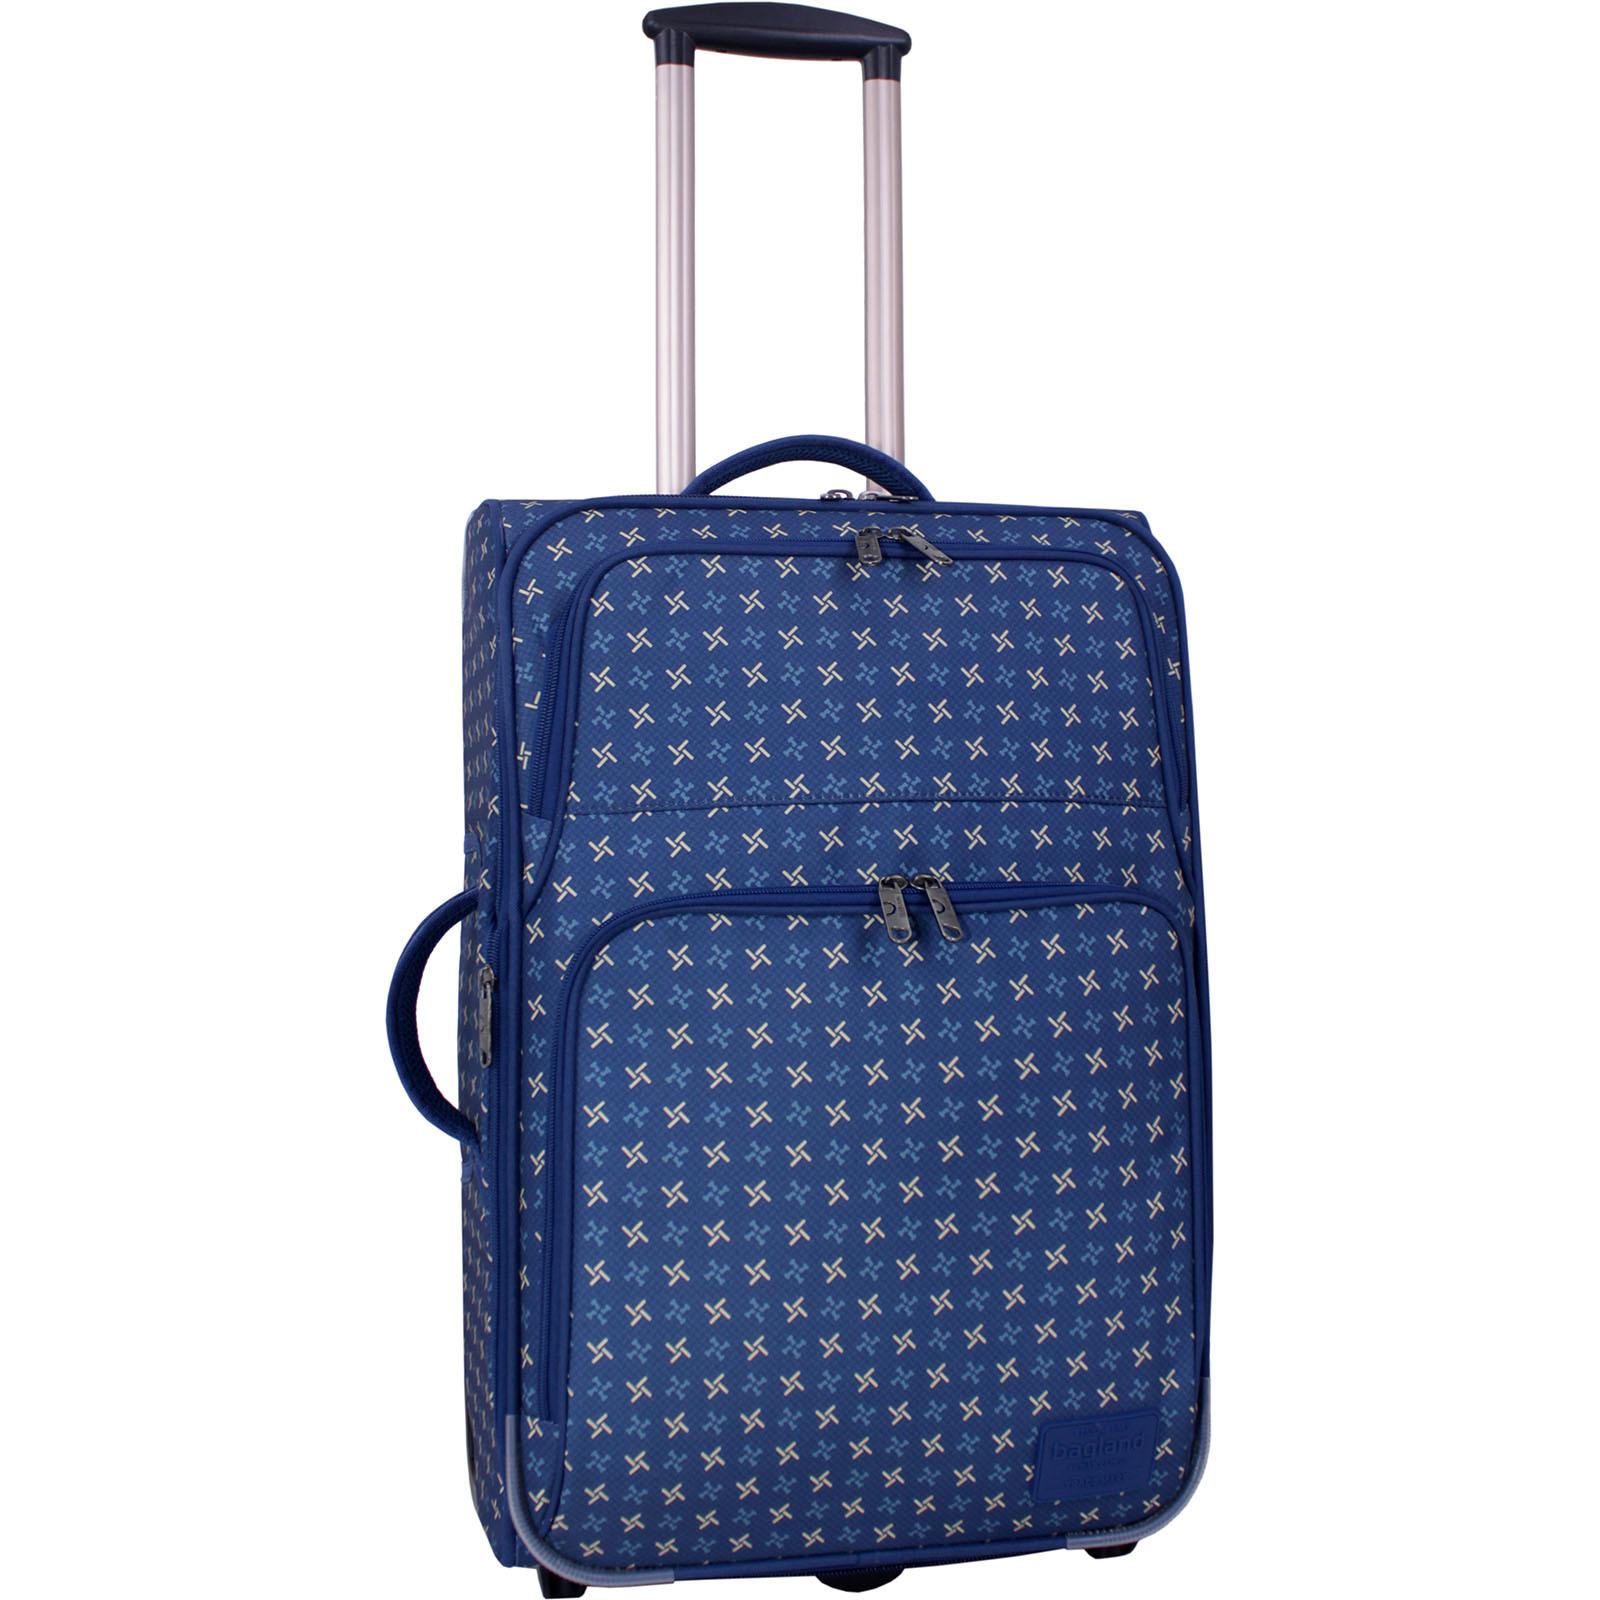 Дорожные чемоданы Чемодан Bagland Леон средний дизайн 51 л. сублімація 463 (0037666244) IMG_4828_суб.463_.JPG